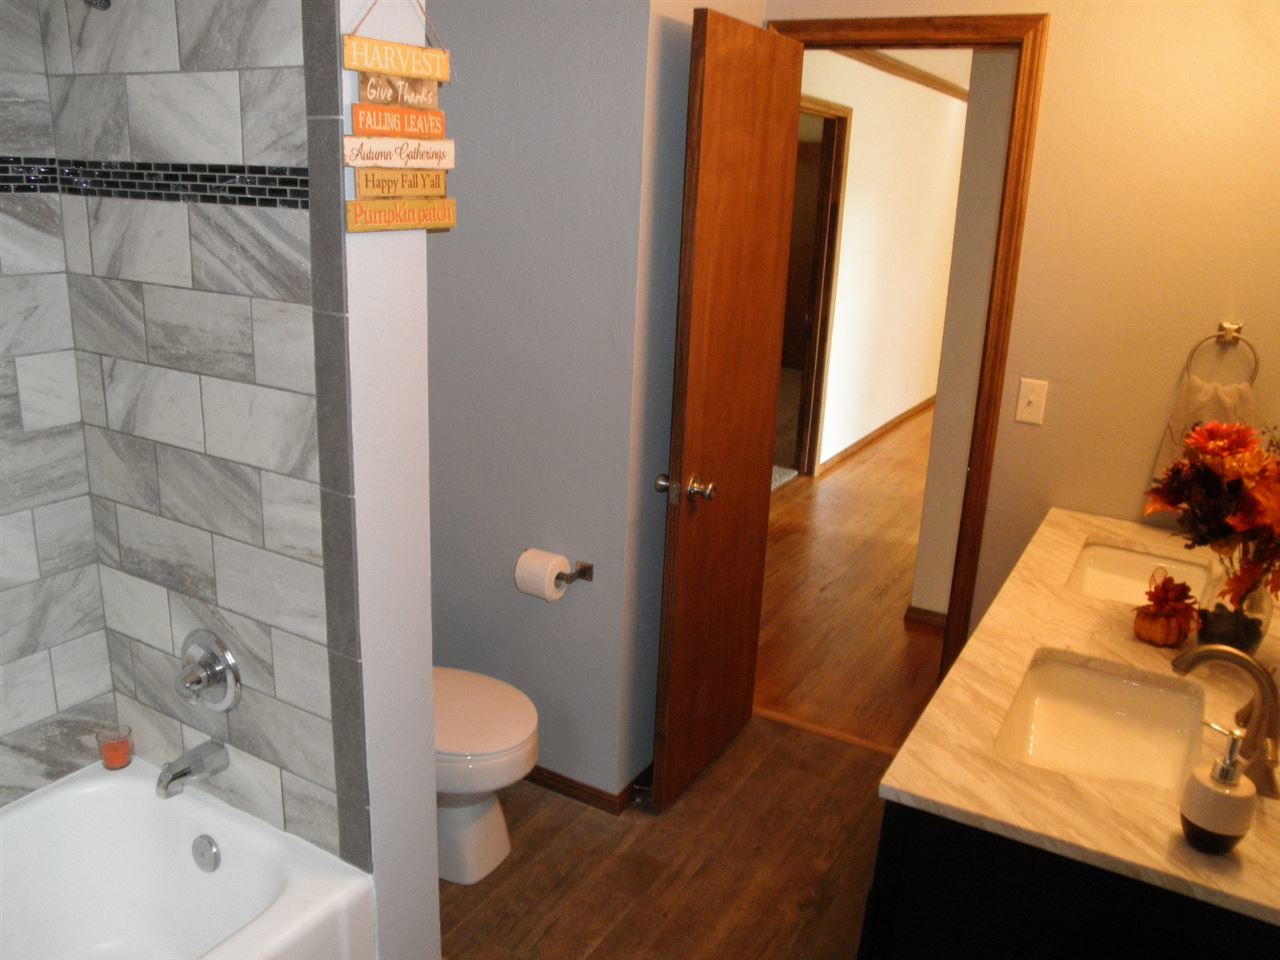 Sold Cross Sale W/ MLS | 204 N 13th  Ponca City, OK 74601 9